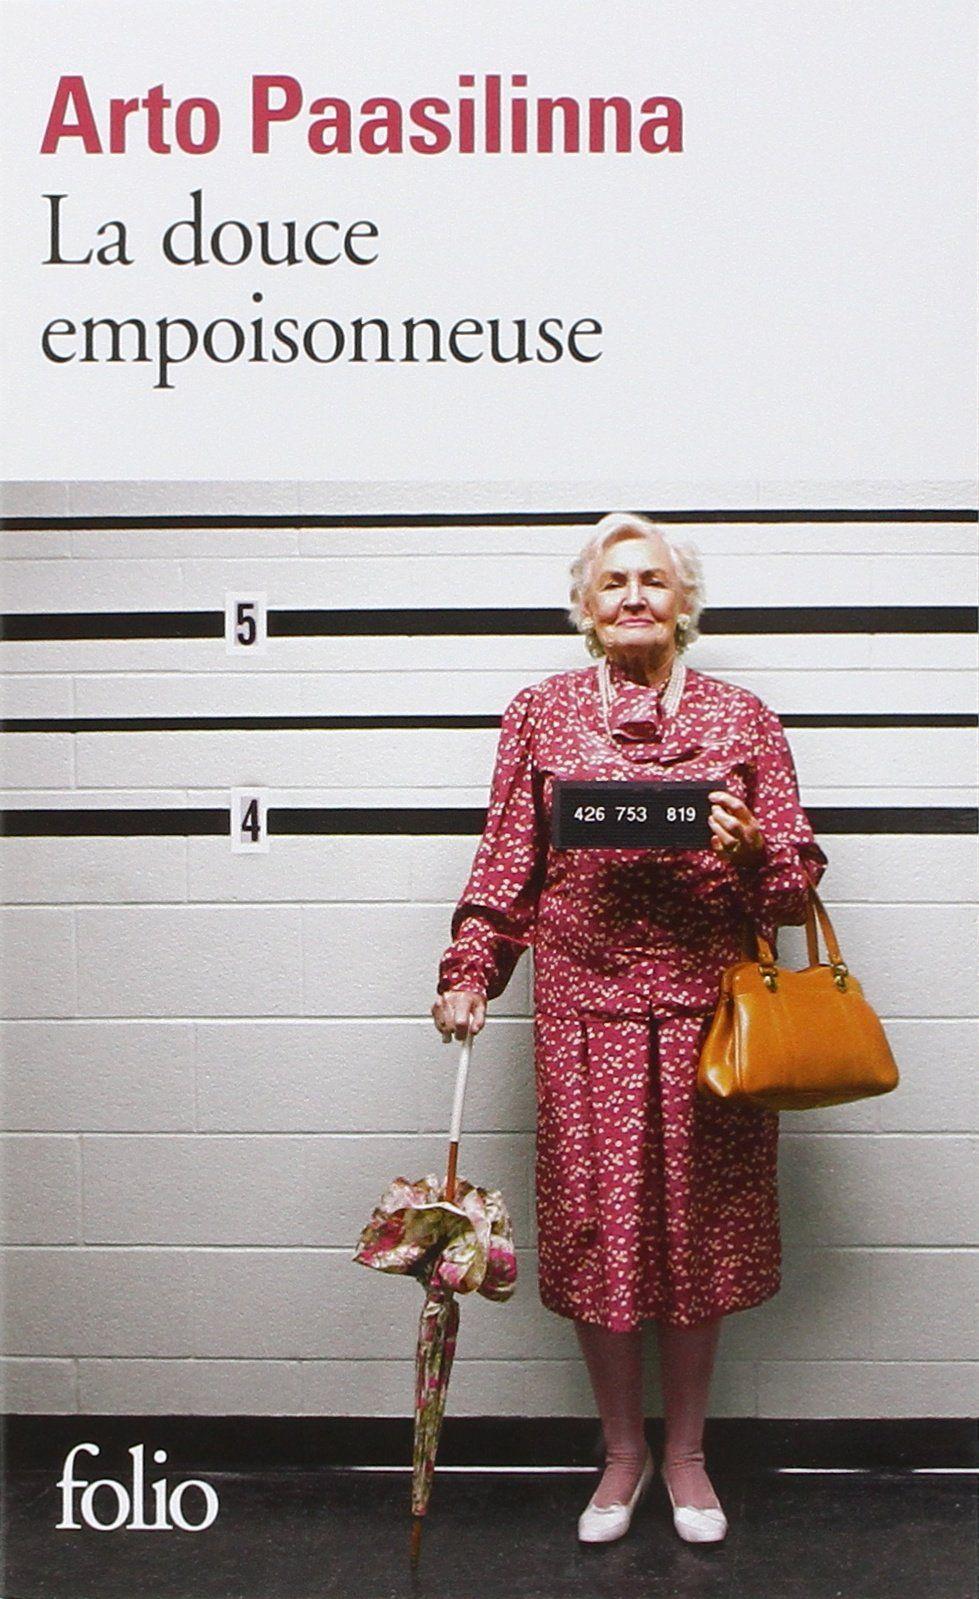 Amazon Fr La Douce Empoisonneuse Arto Paasilinna Anne Colin Du Terrail Livres Forever Book Film Books Ebook